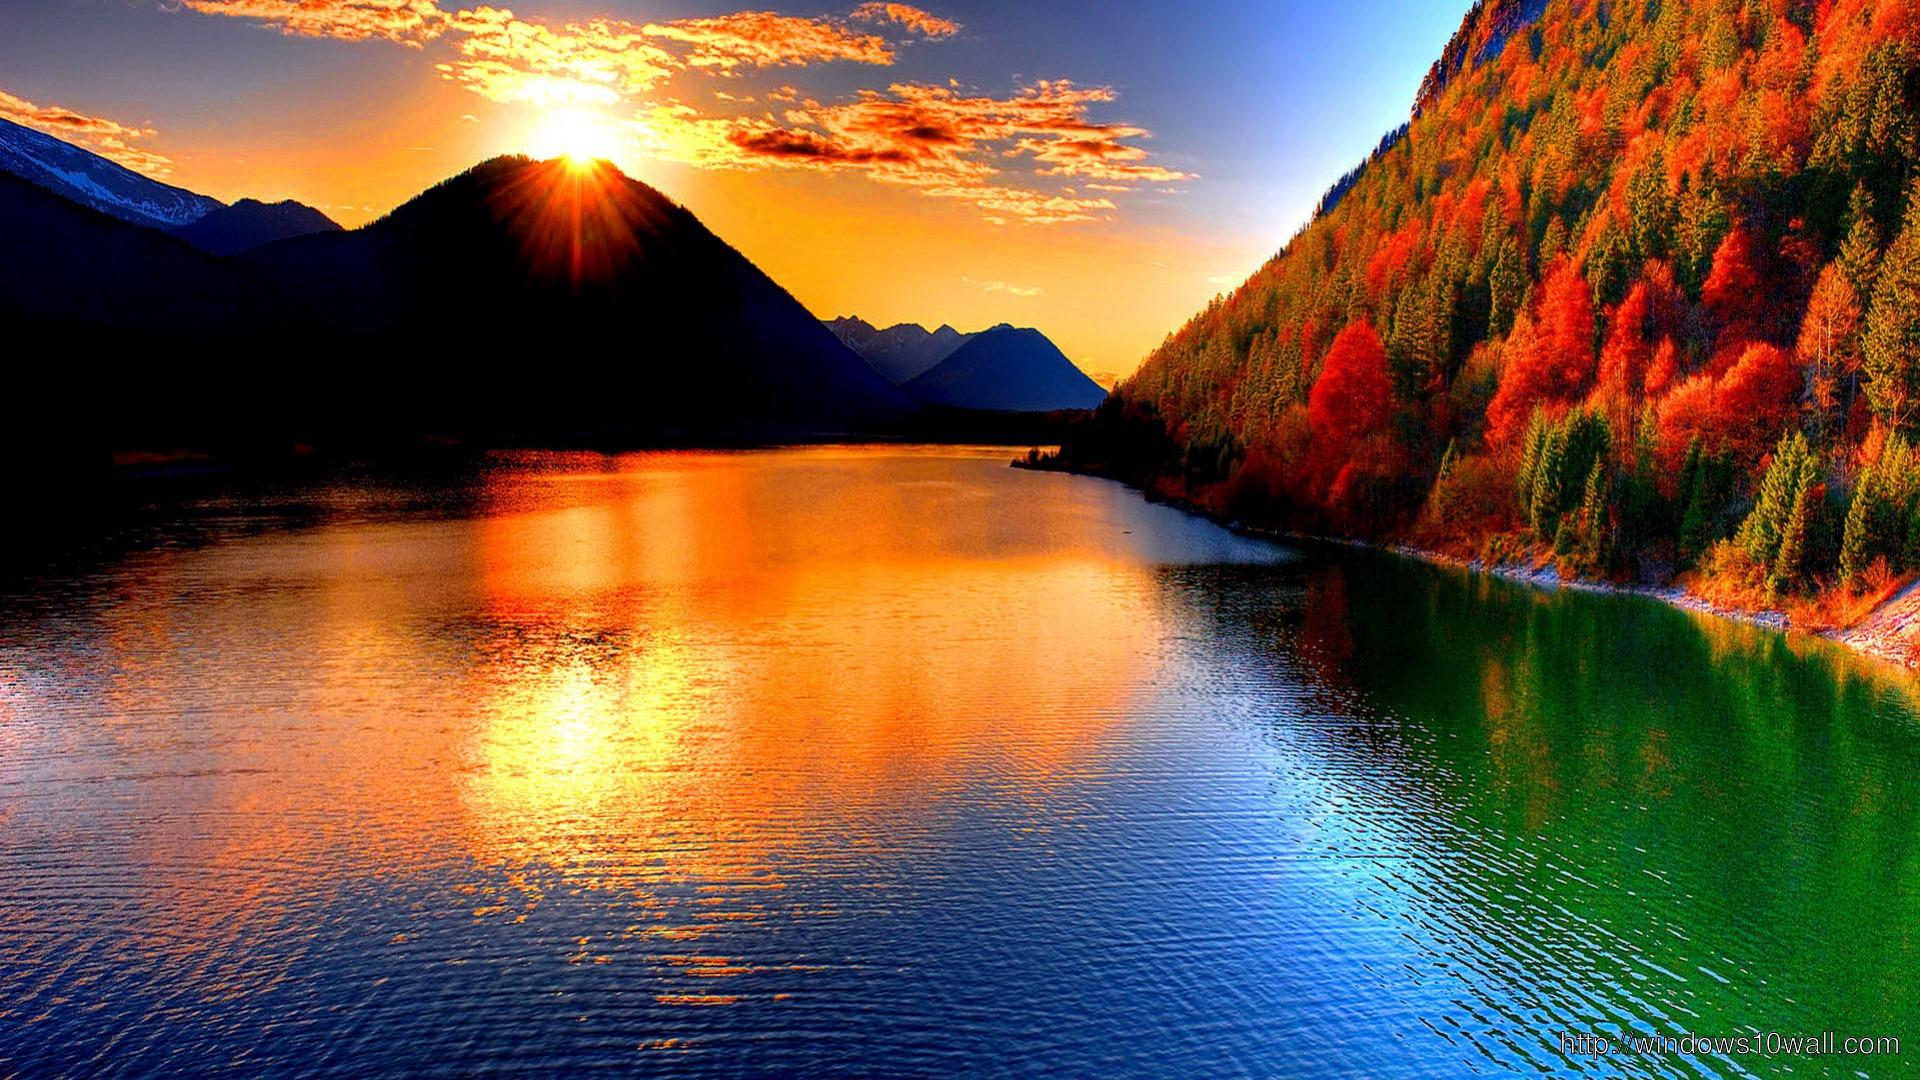 Beautiful Sunset Wallpaper Lake - windows 10 Wallpapers